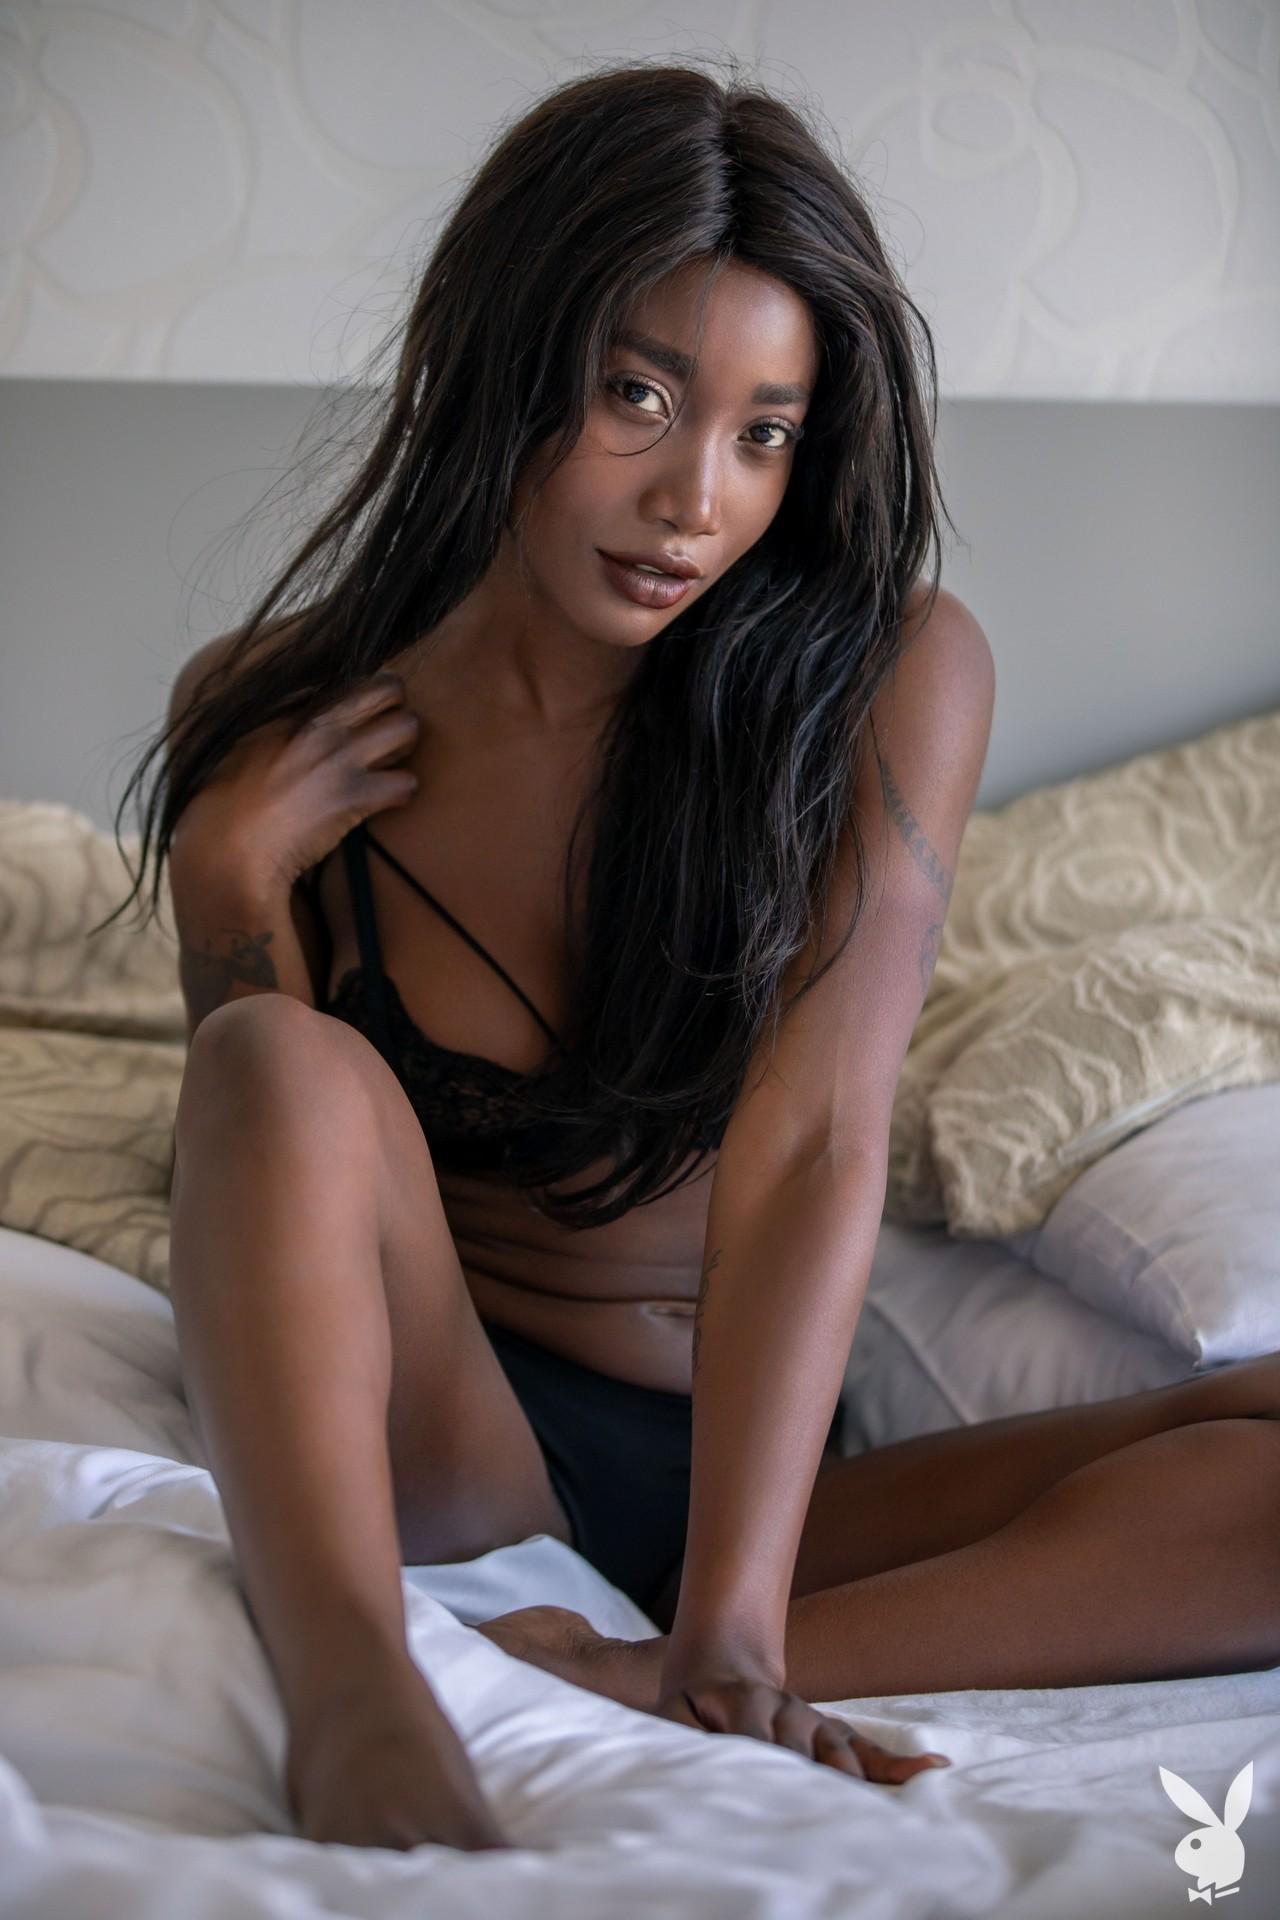 Mimi Desuka - Playboy photoshoot